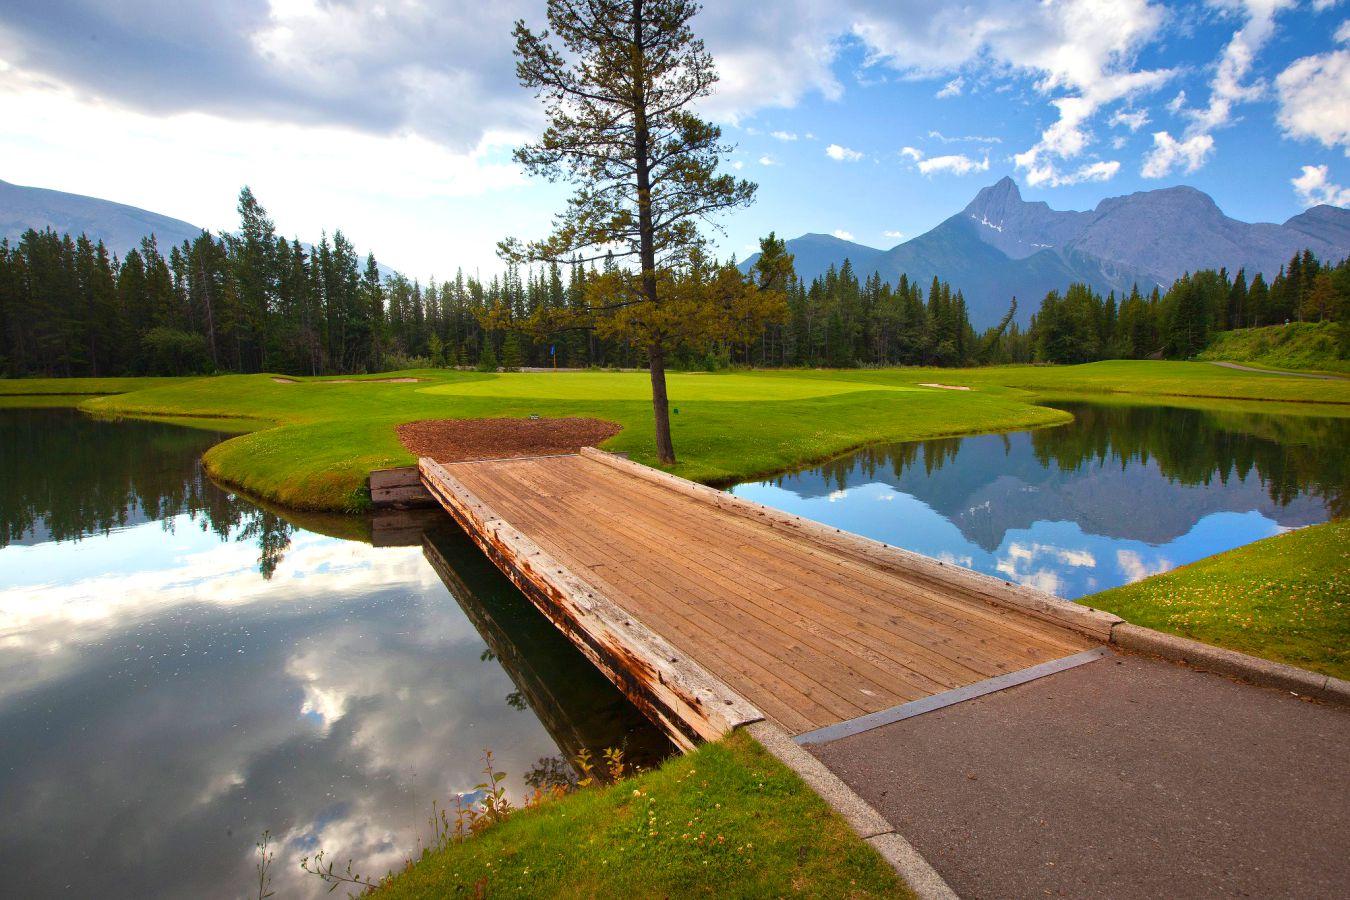 kananaskis-golf-course-24